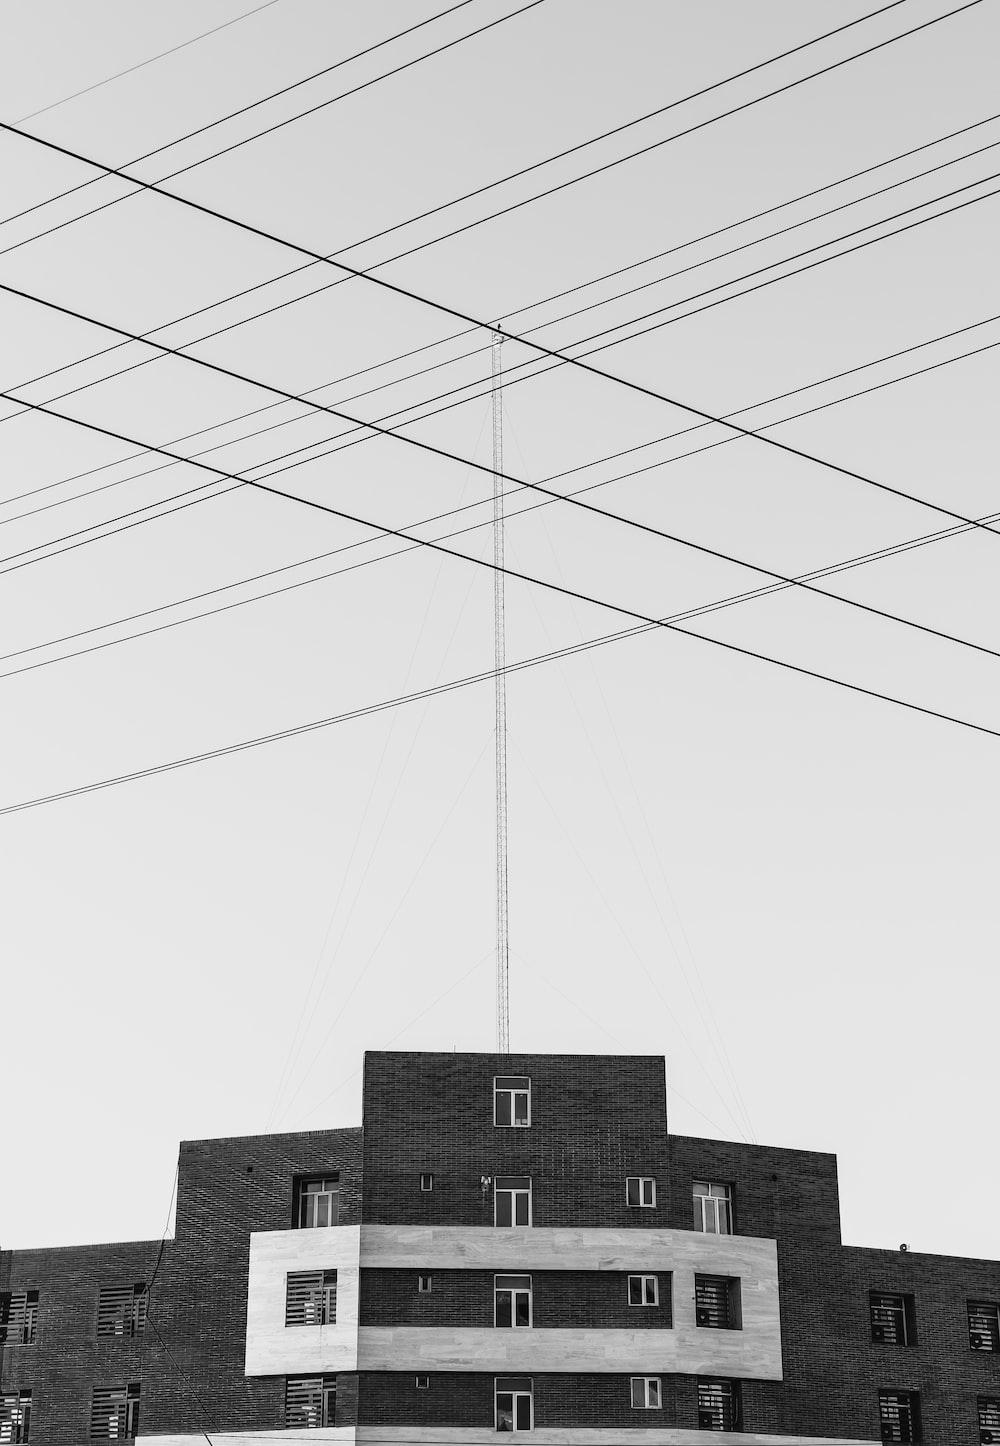 greyscale photo of buildin